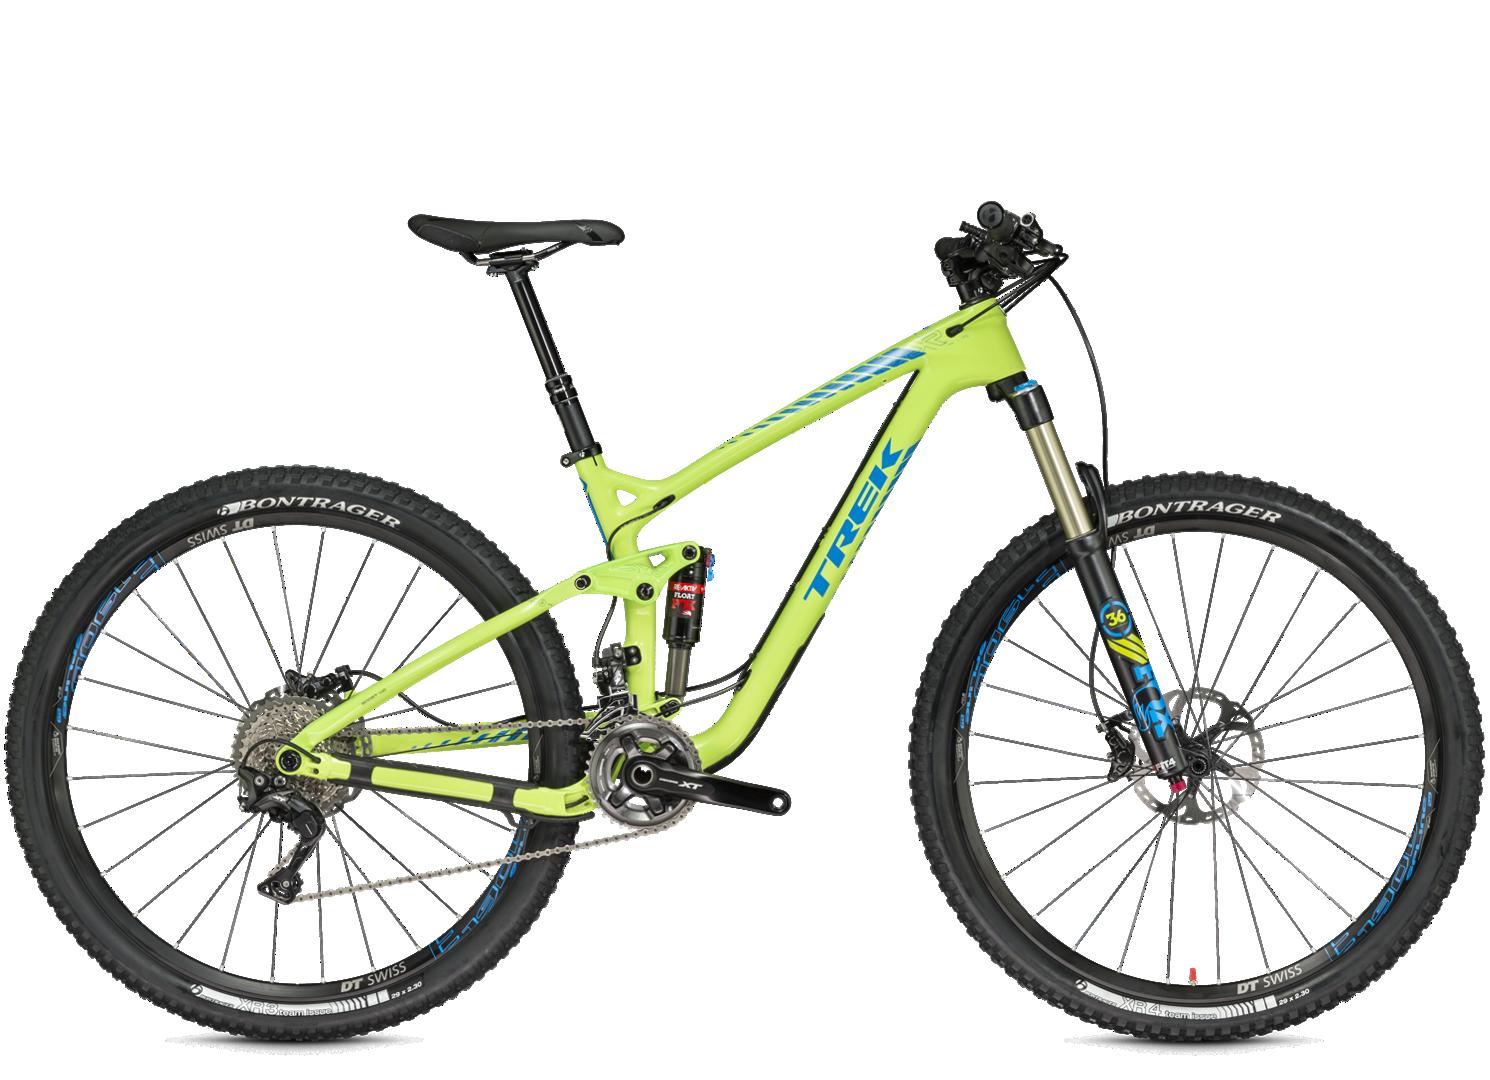 f7671eb9fdf 2016 Remedy 9.8 29 - Bike Archive - Trek Bicycle